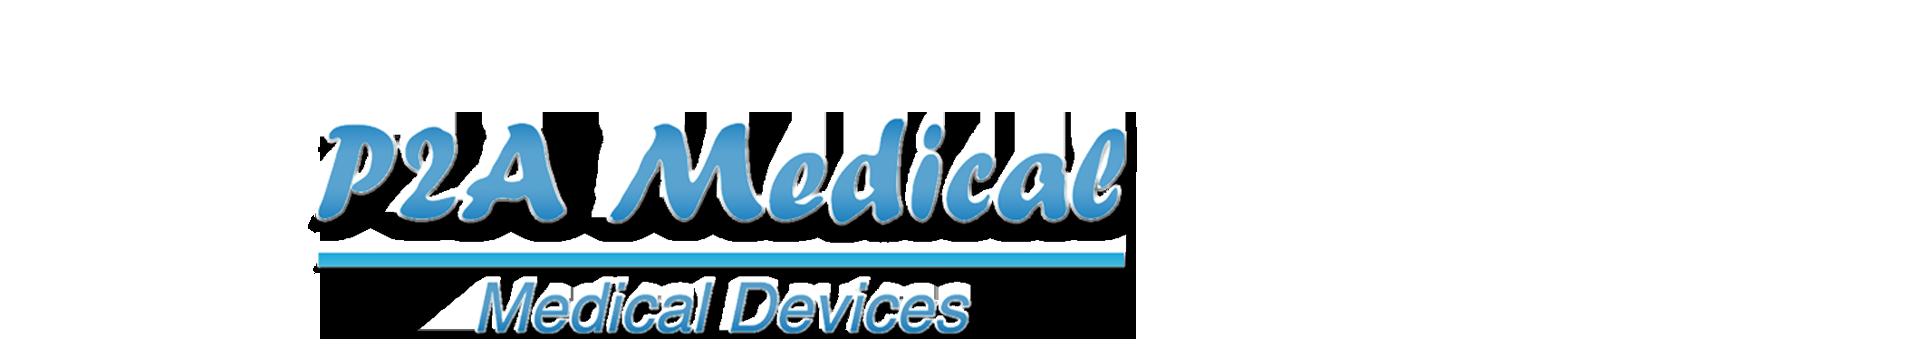 P2A Medical Logo